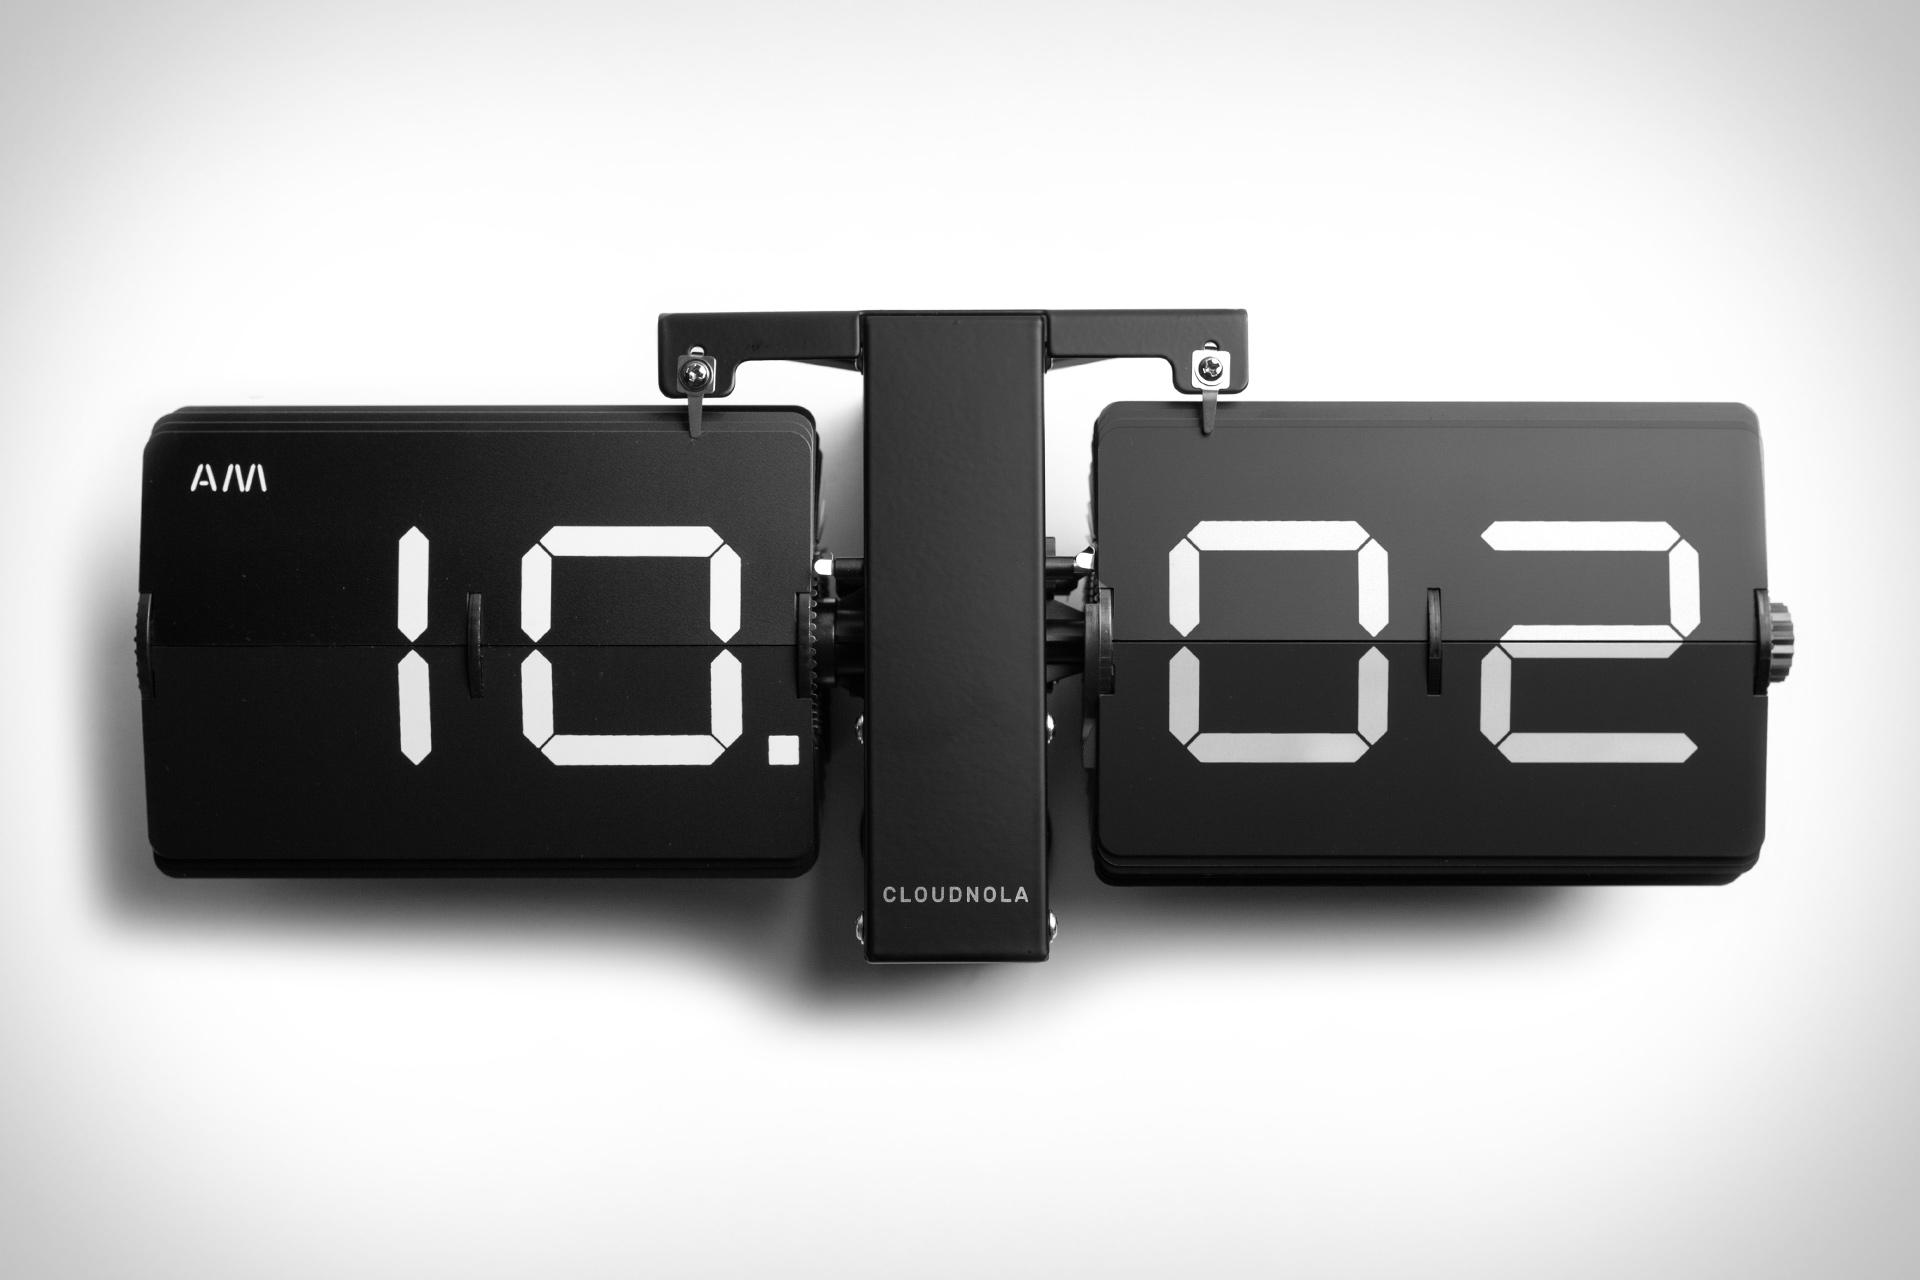 Cloudnola Flip Clock